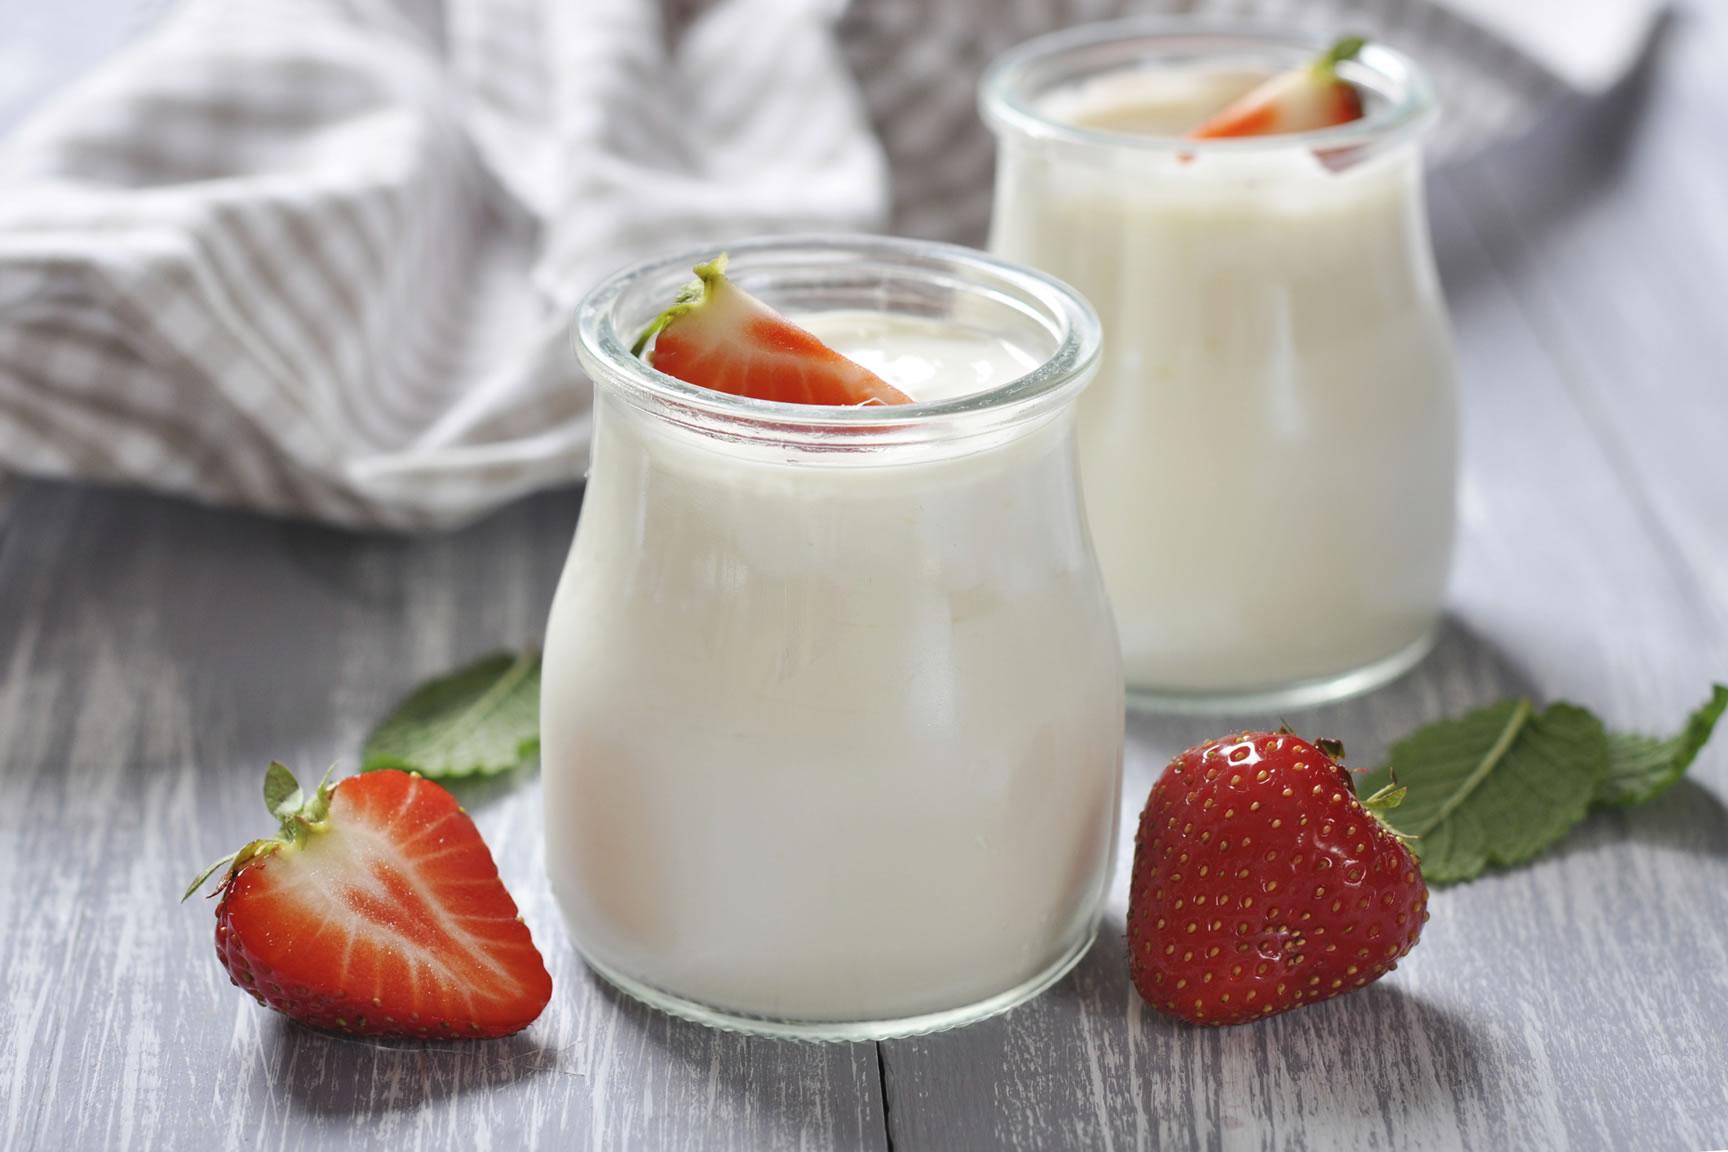 Dưỡng da tại nhà hiệu quả với sữa chua